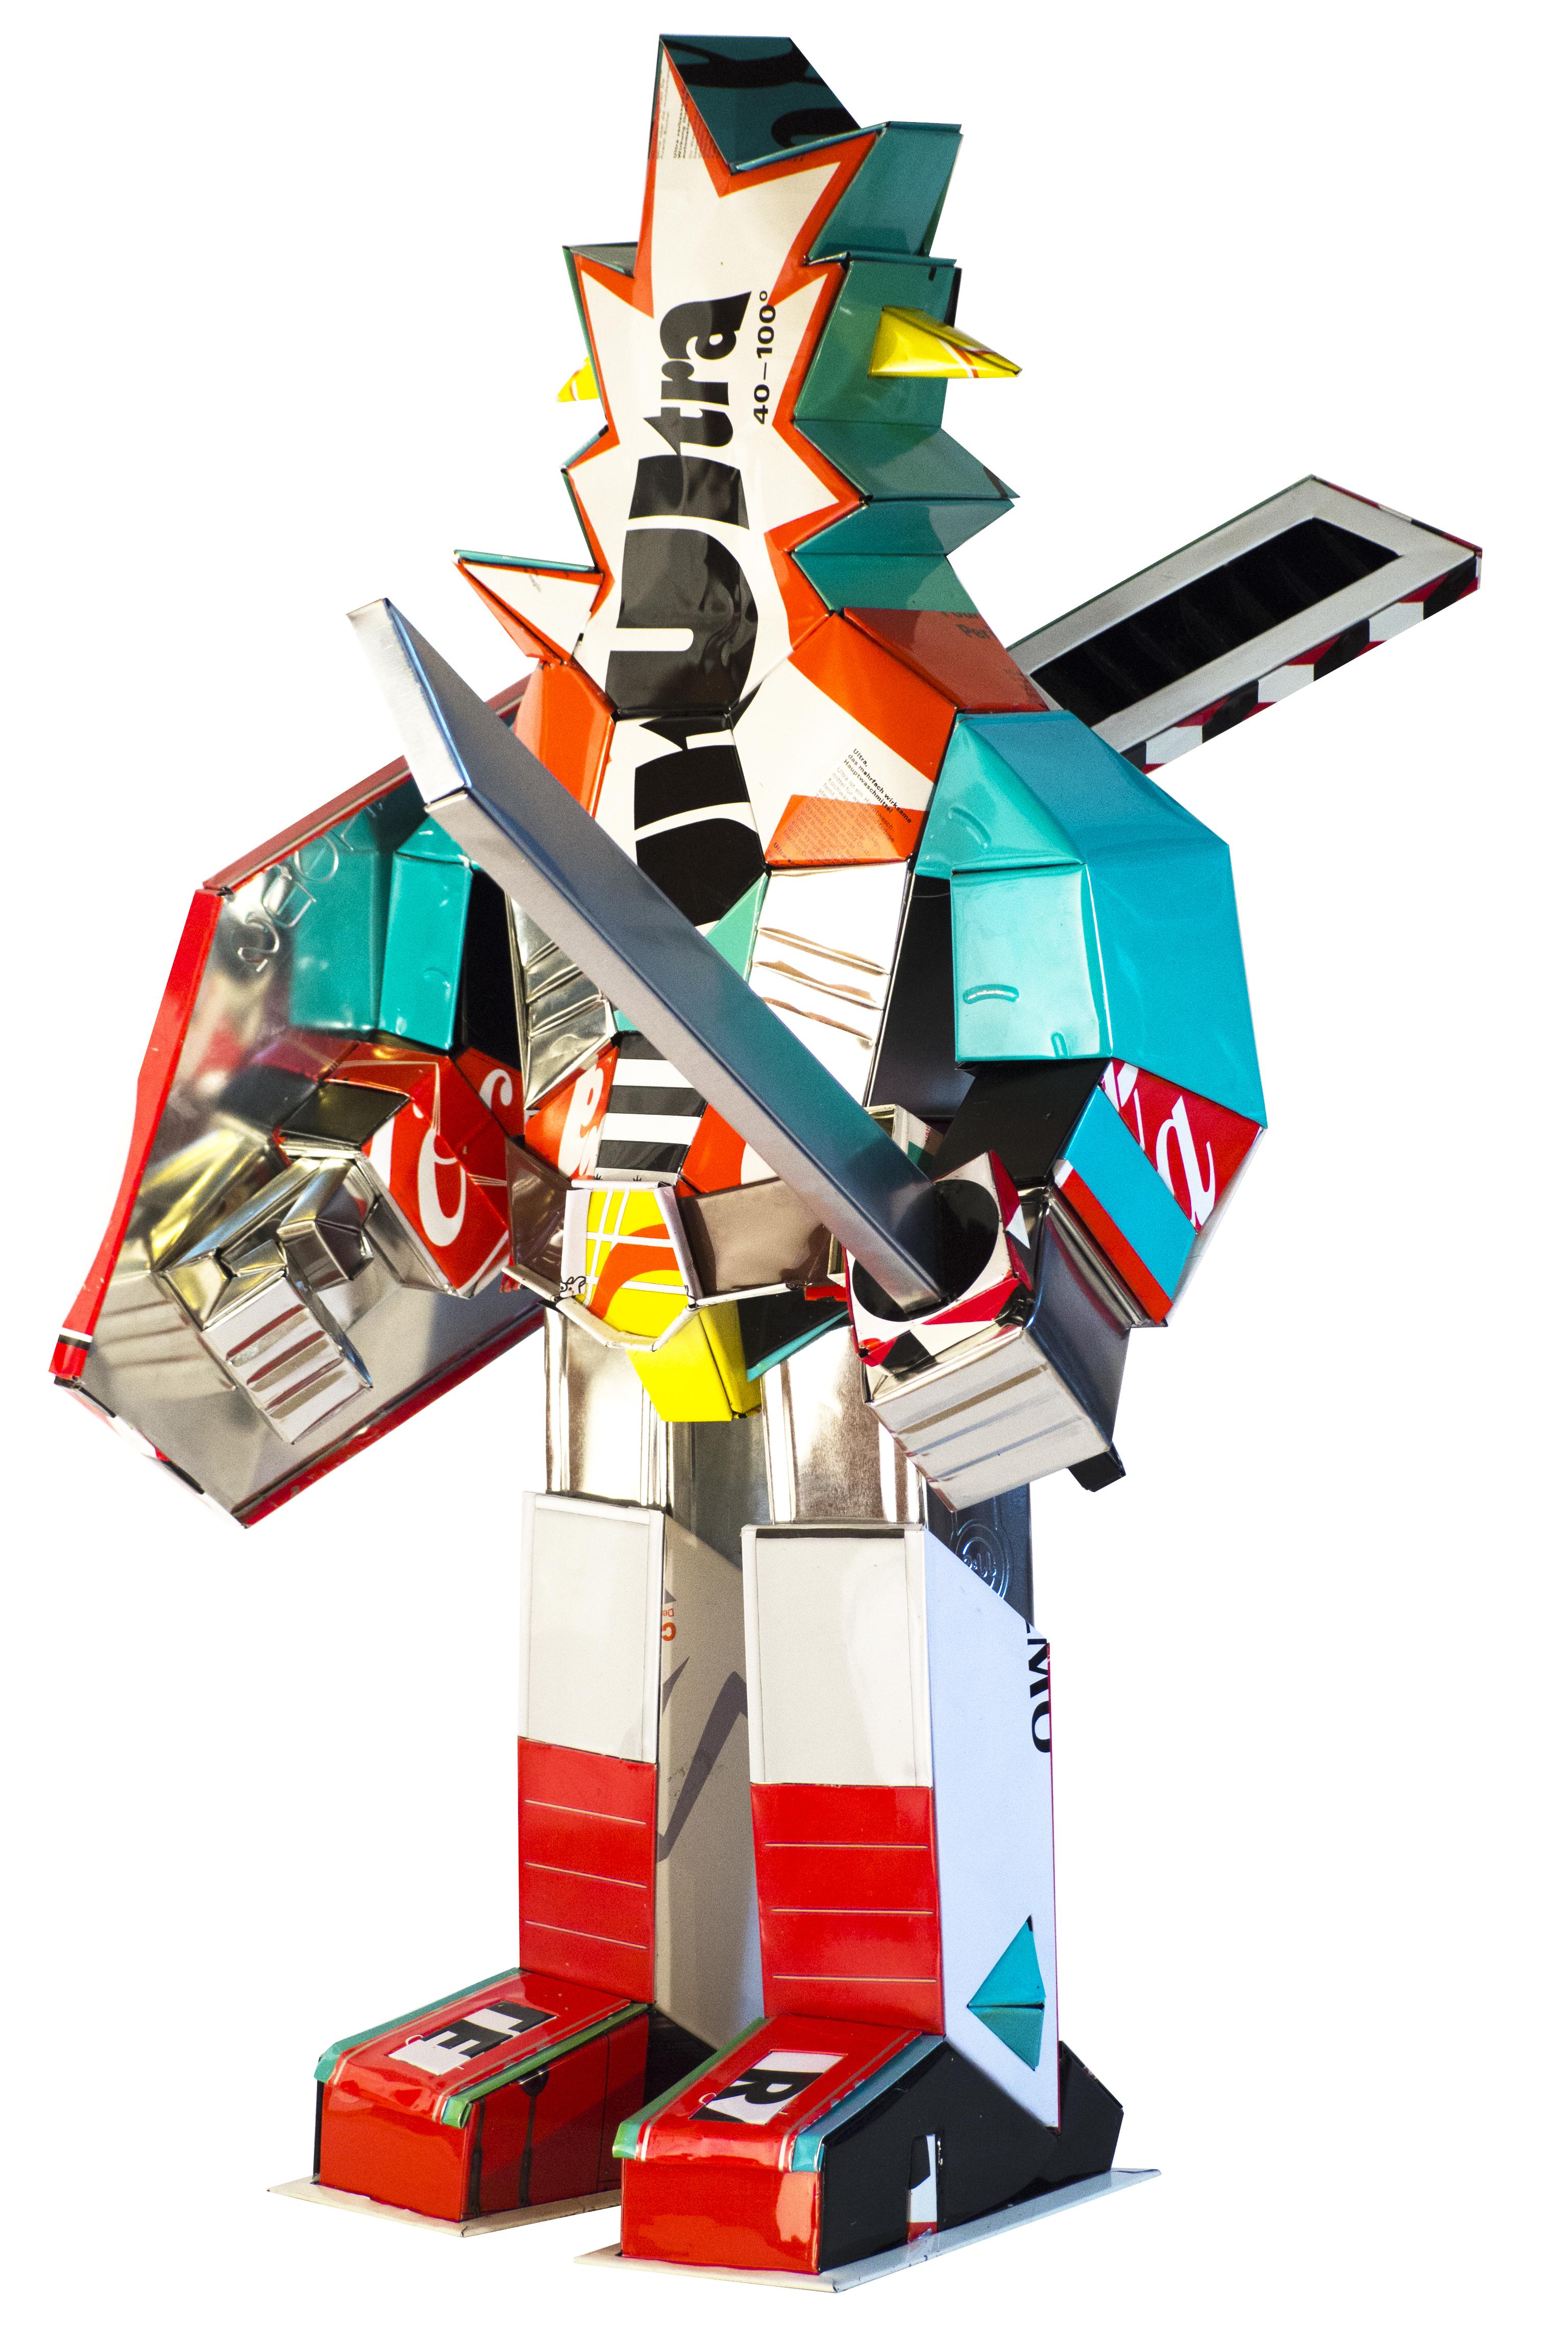 Robotyp UIHULTRA H:90CM